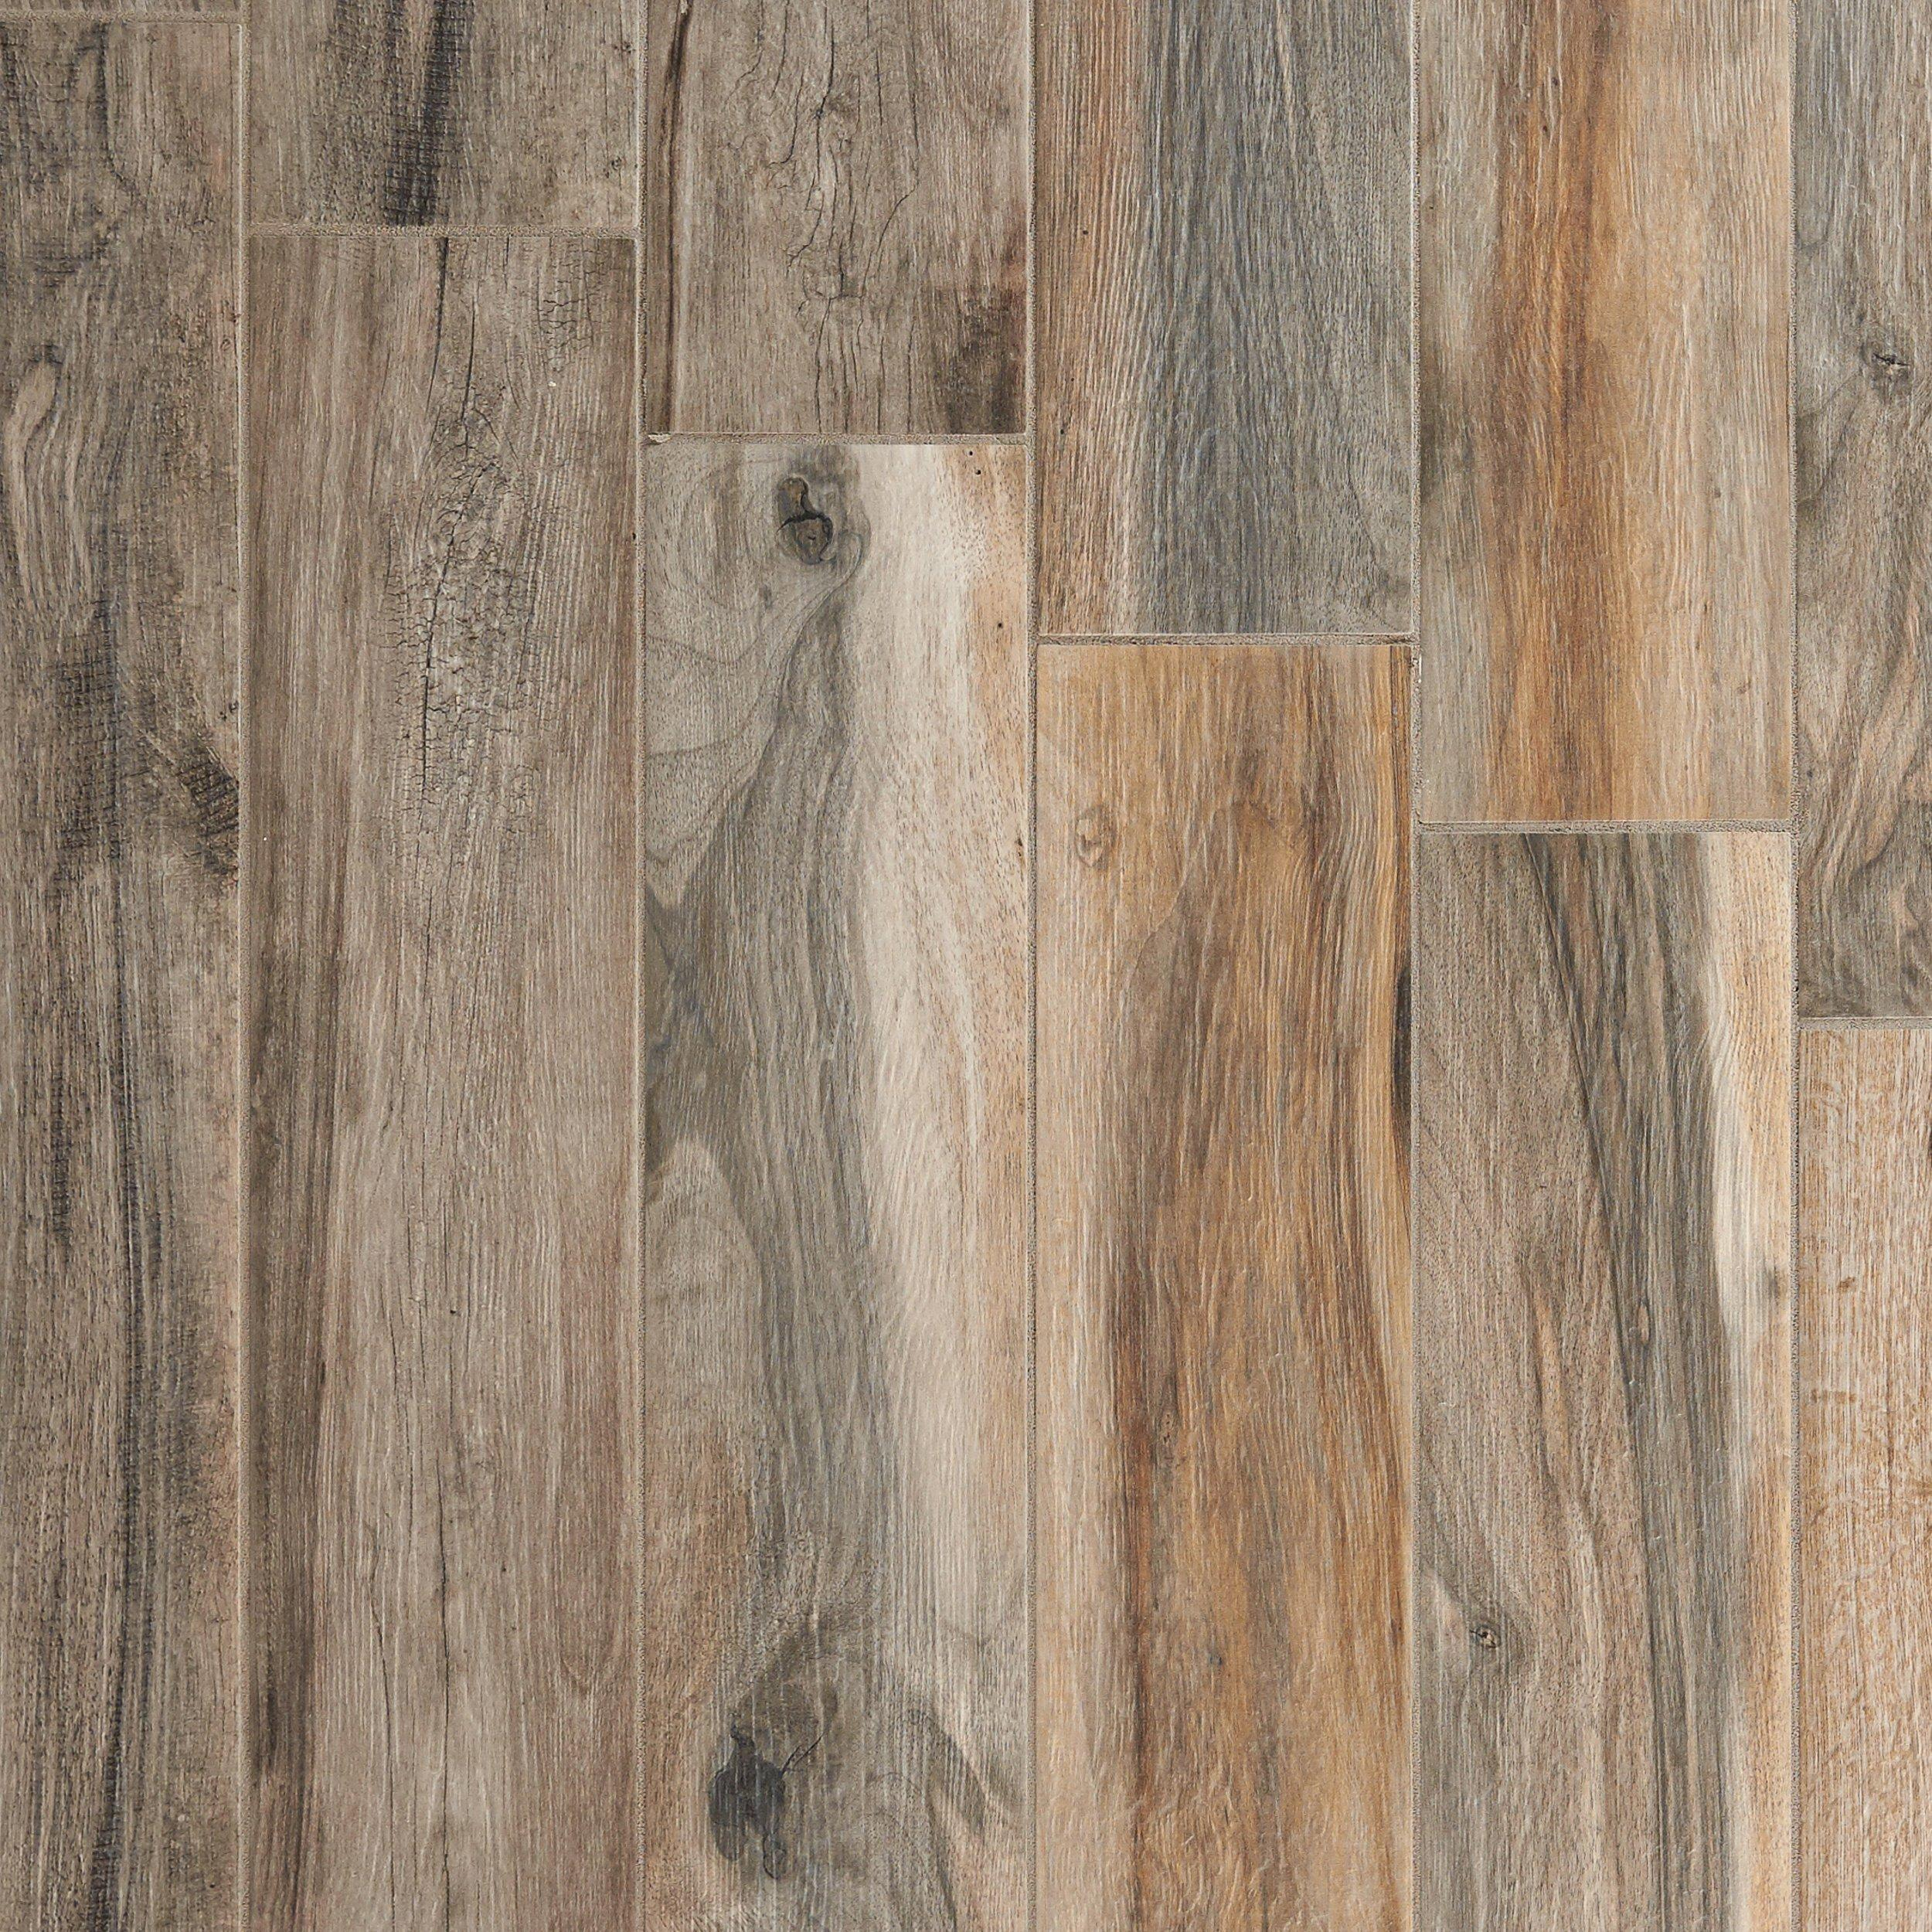 Soft Ash Wood Plank Porcelain Tile 6 x 40 100105923 Floor